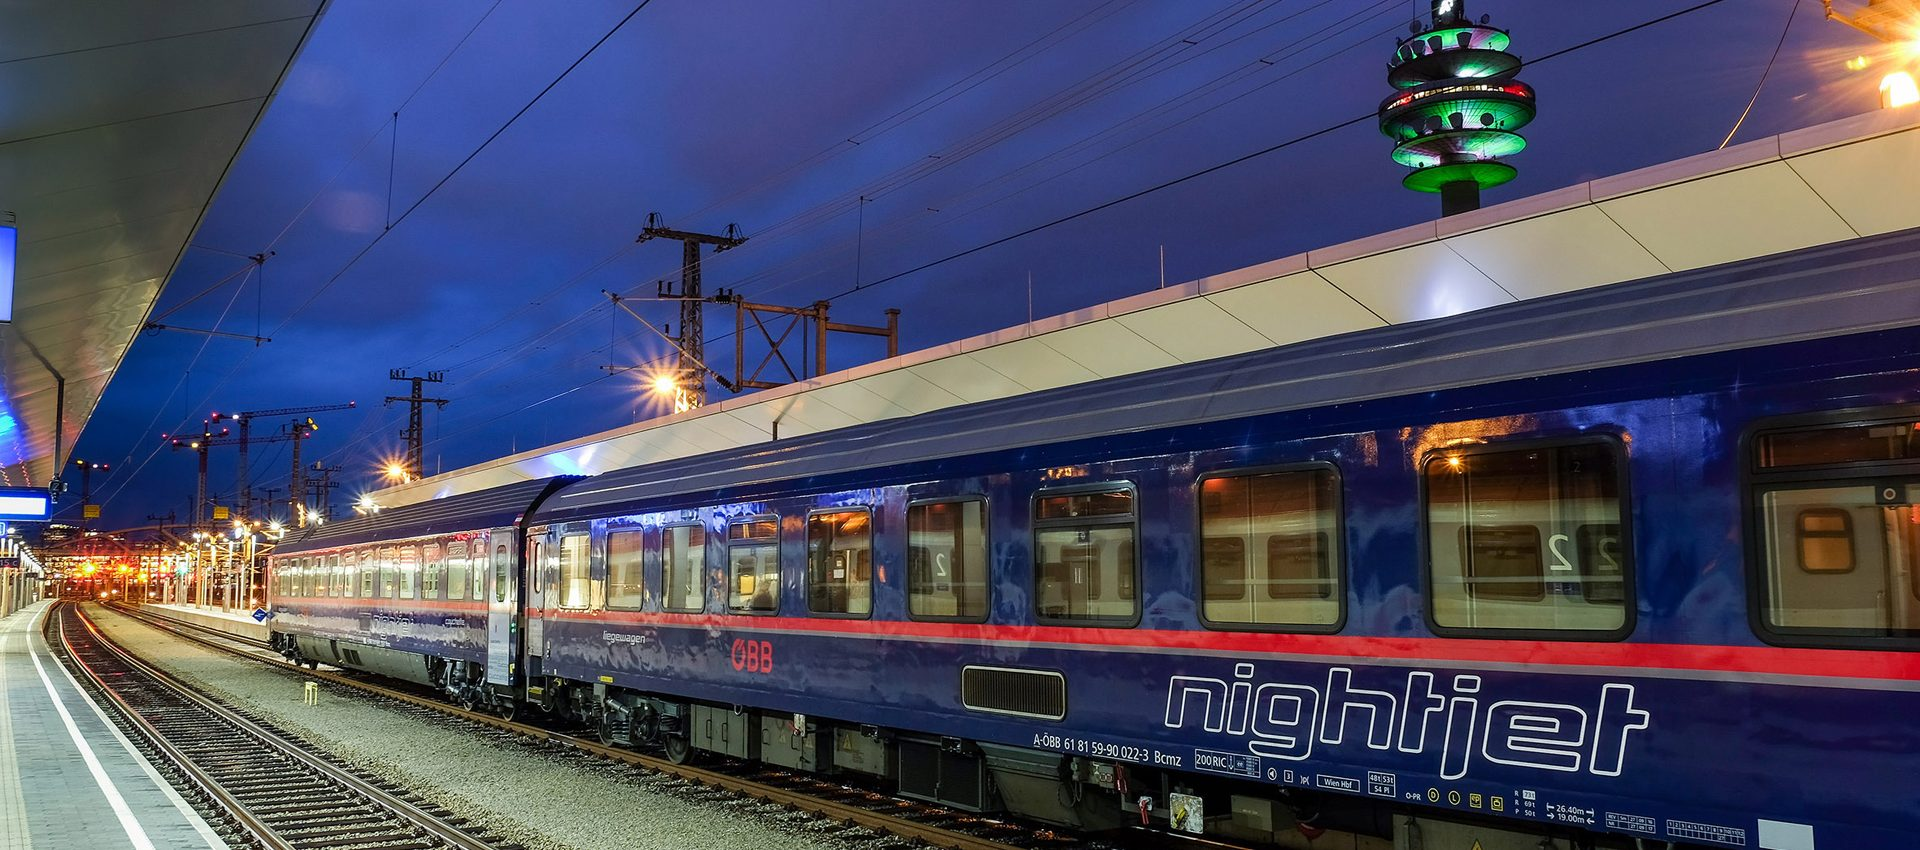 Nightjet Abendaufnahme am Bahnhof